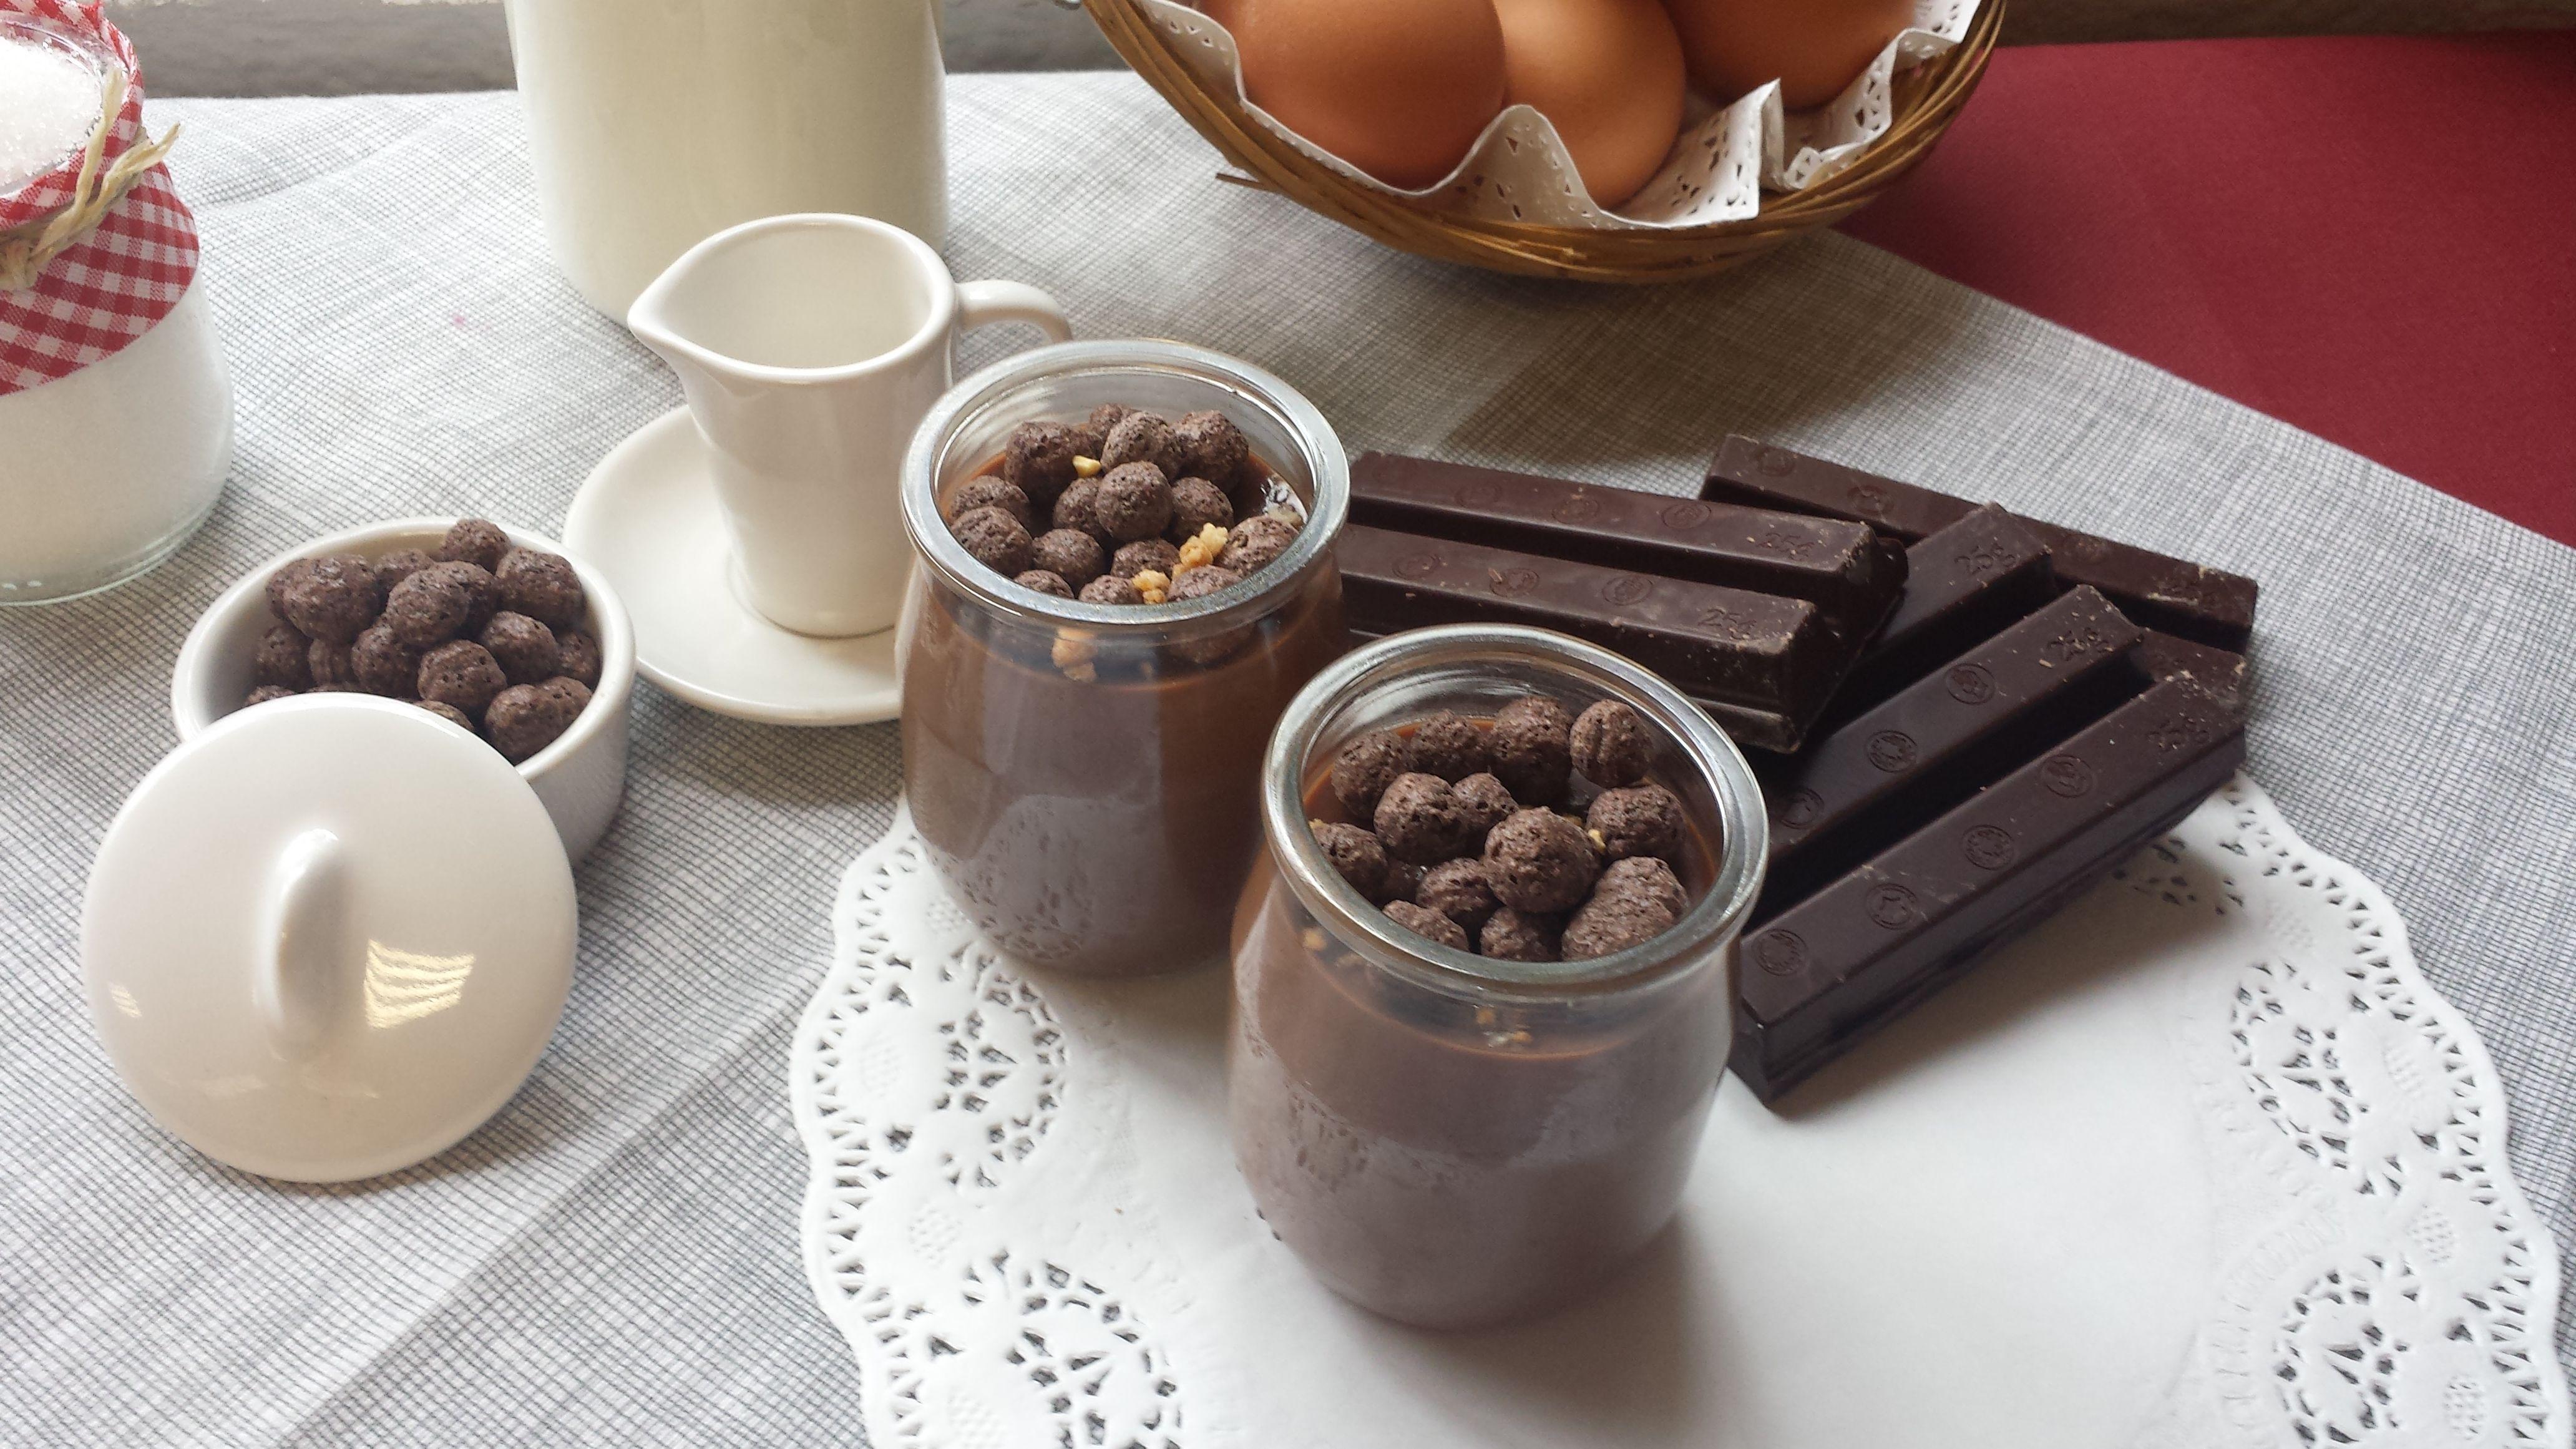 Natillas de chocolate! ¡Buenísimas! #postres